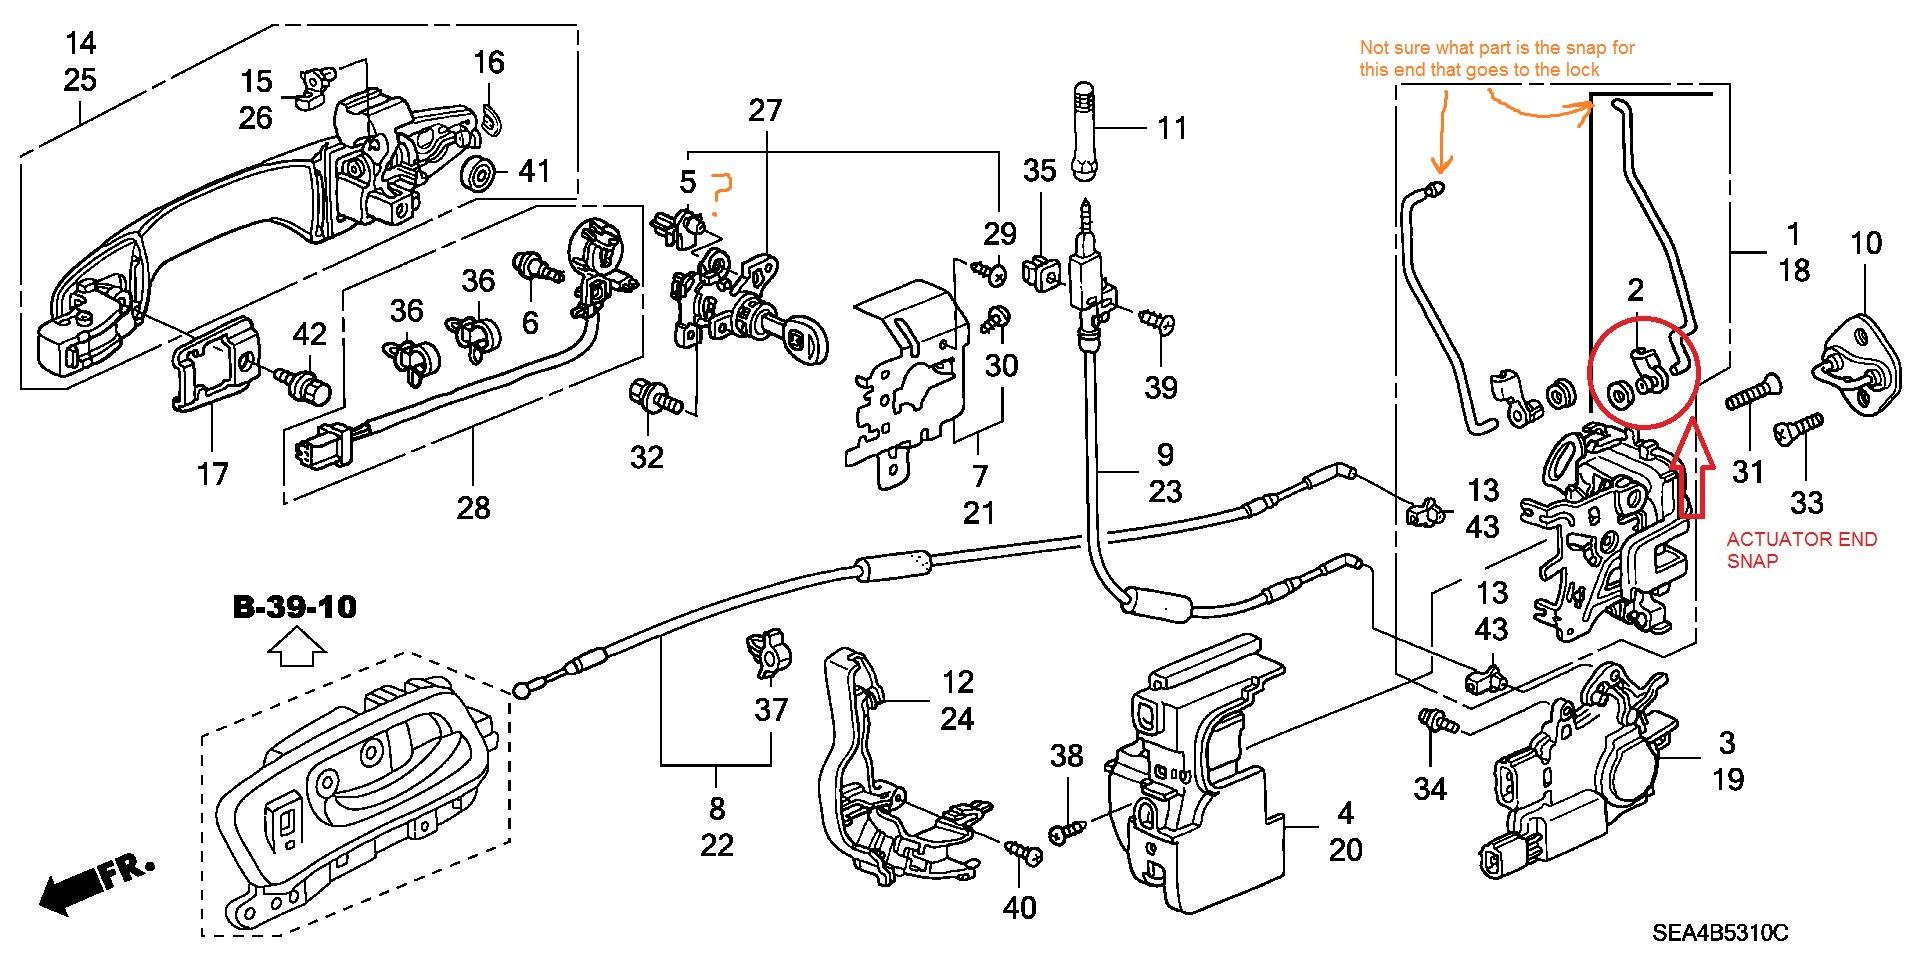 F-179: DIY-Pass. Door Lock Actuator Replacement, W/ Pics